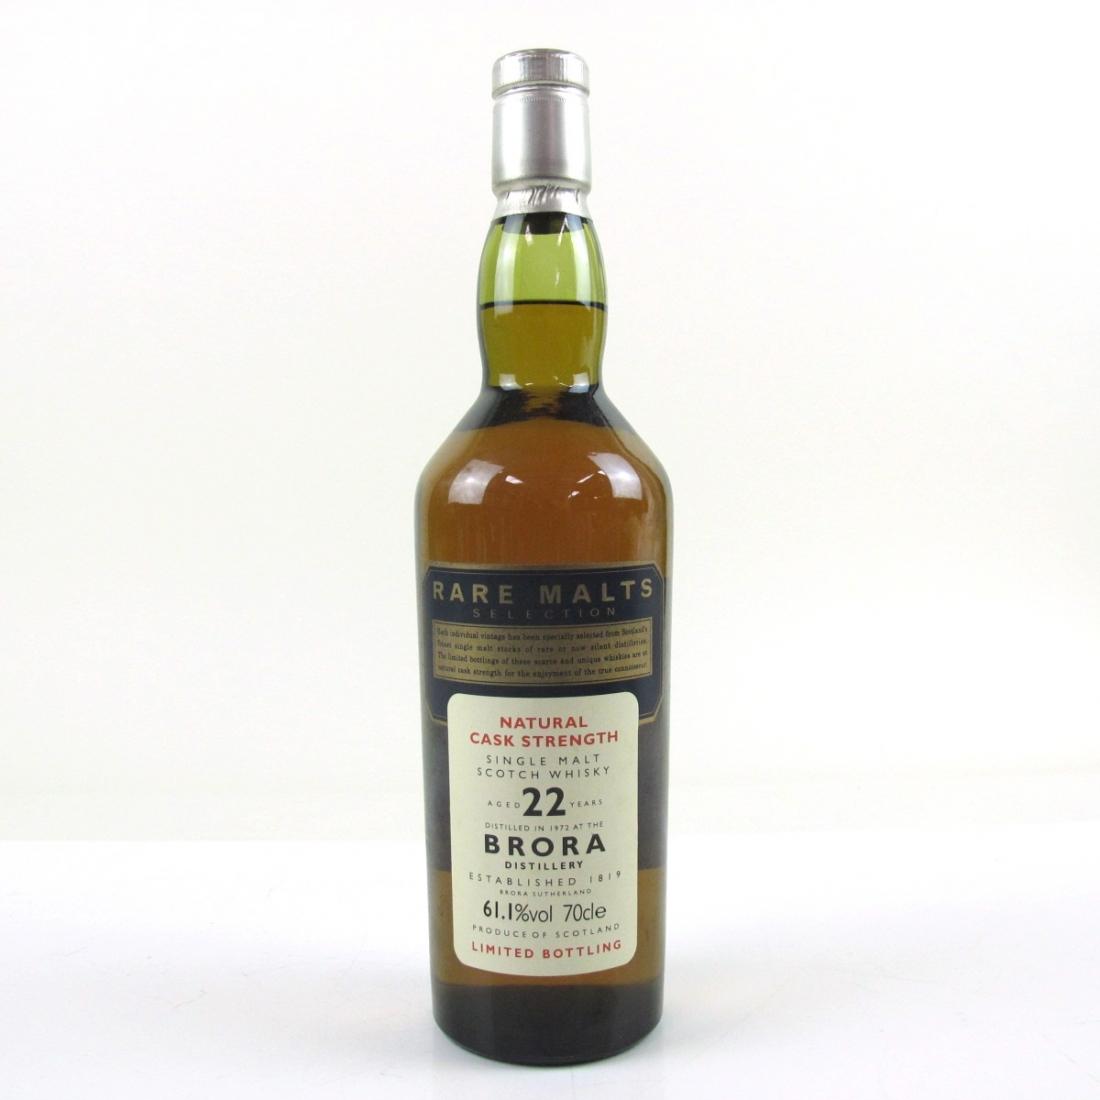 Brora 1972 Rare Malt 22 Year Old / 61.1%